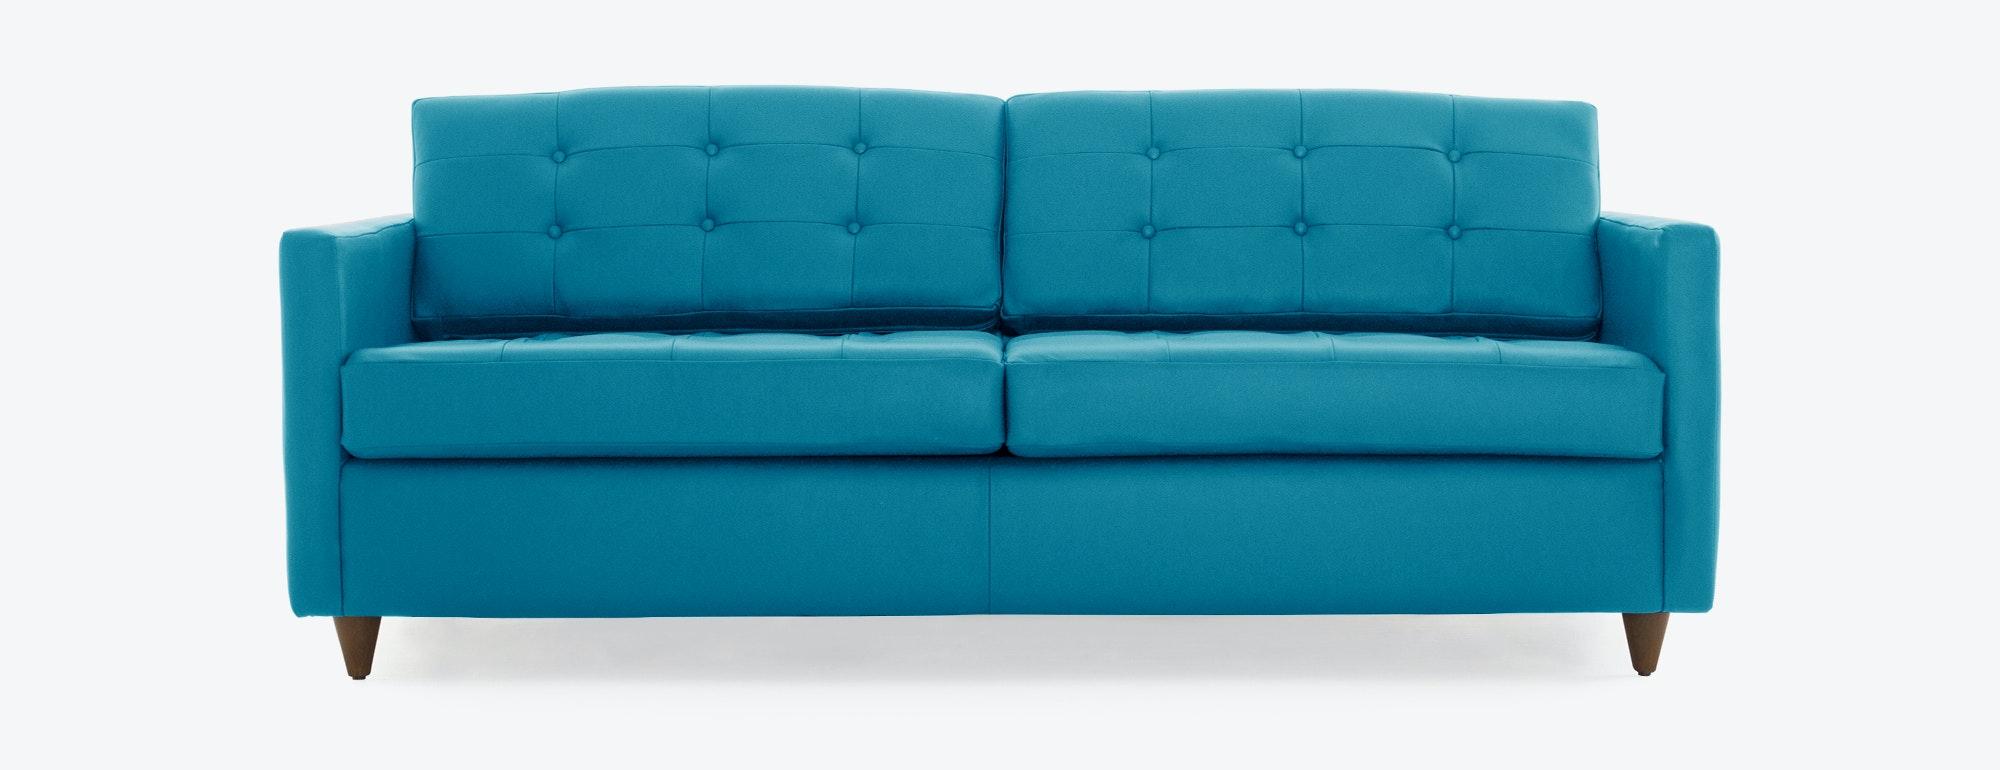 Eliot Leather Sleeper Sofa Joybird